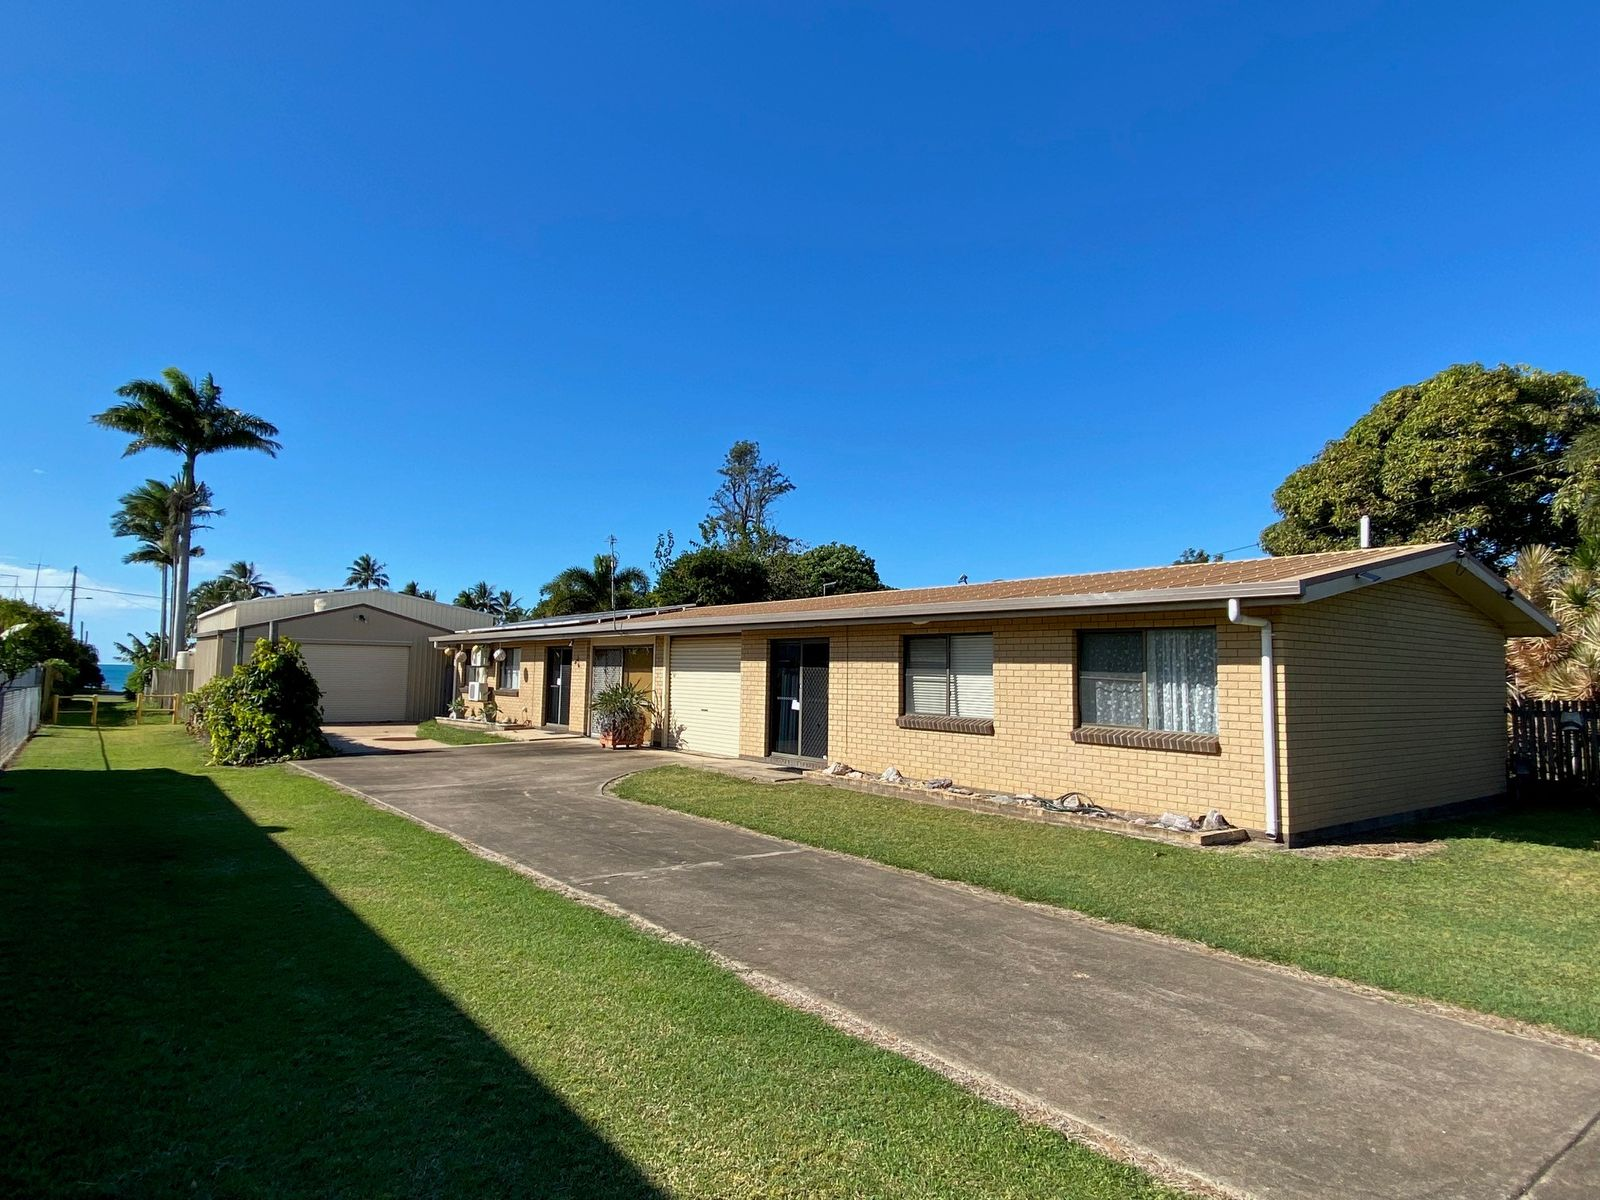 25 Hellwege Street, Hay Point, QLD 4740